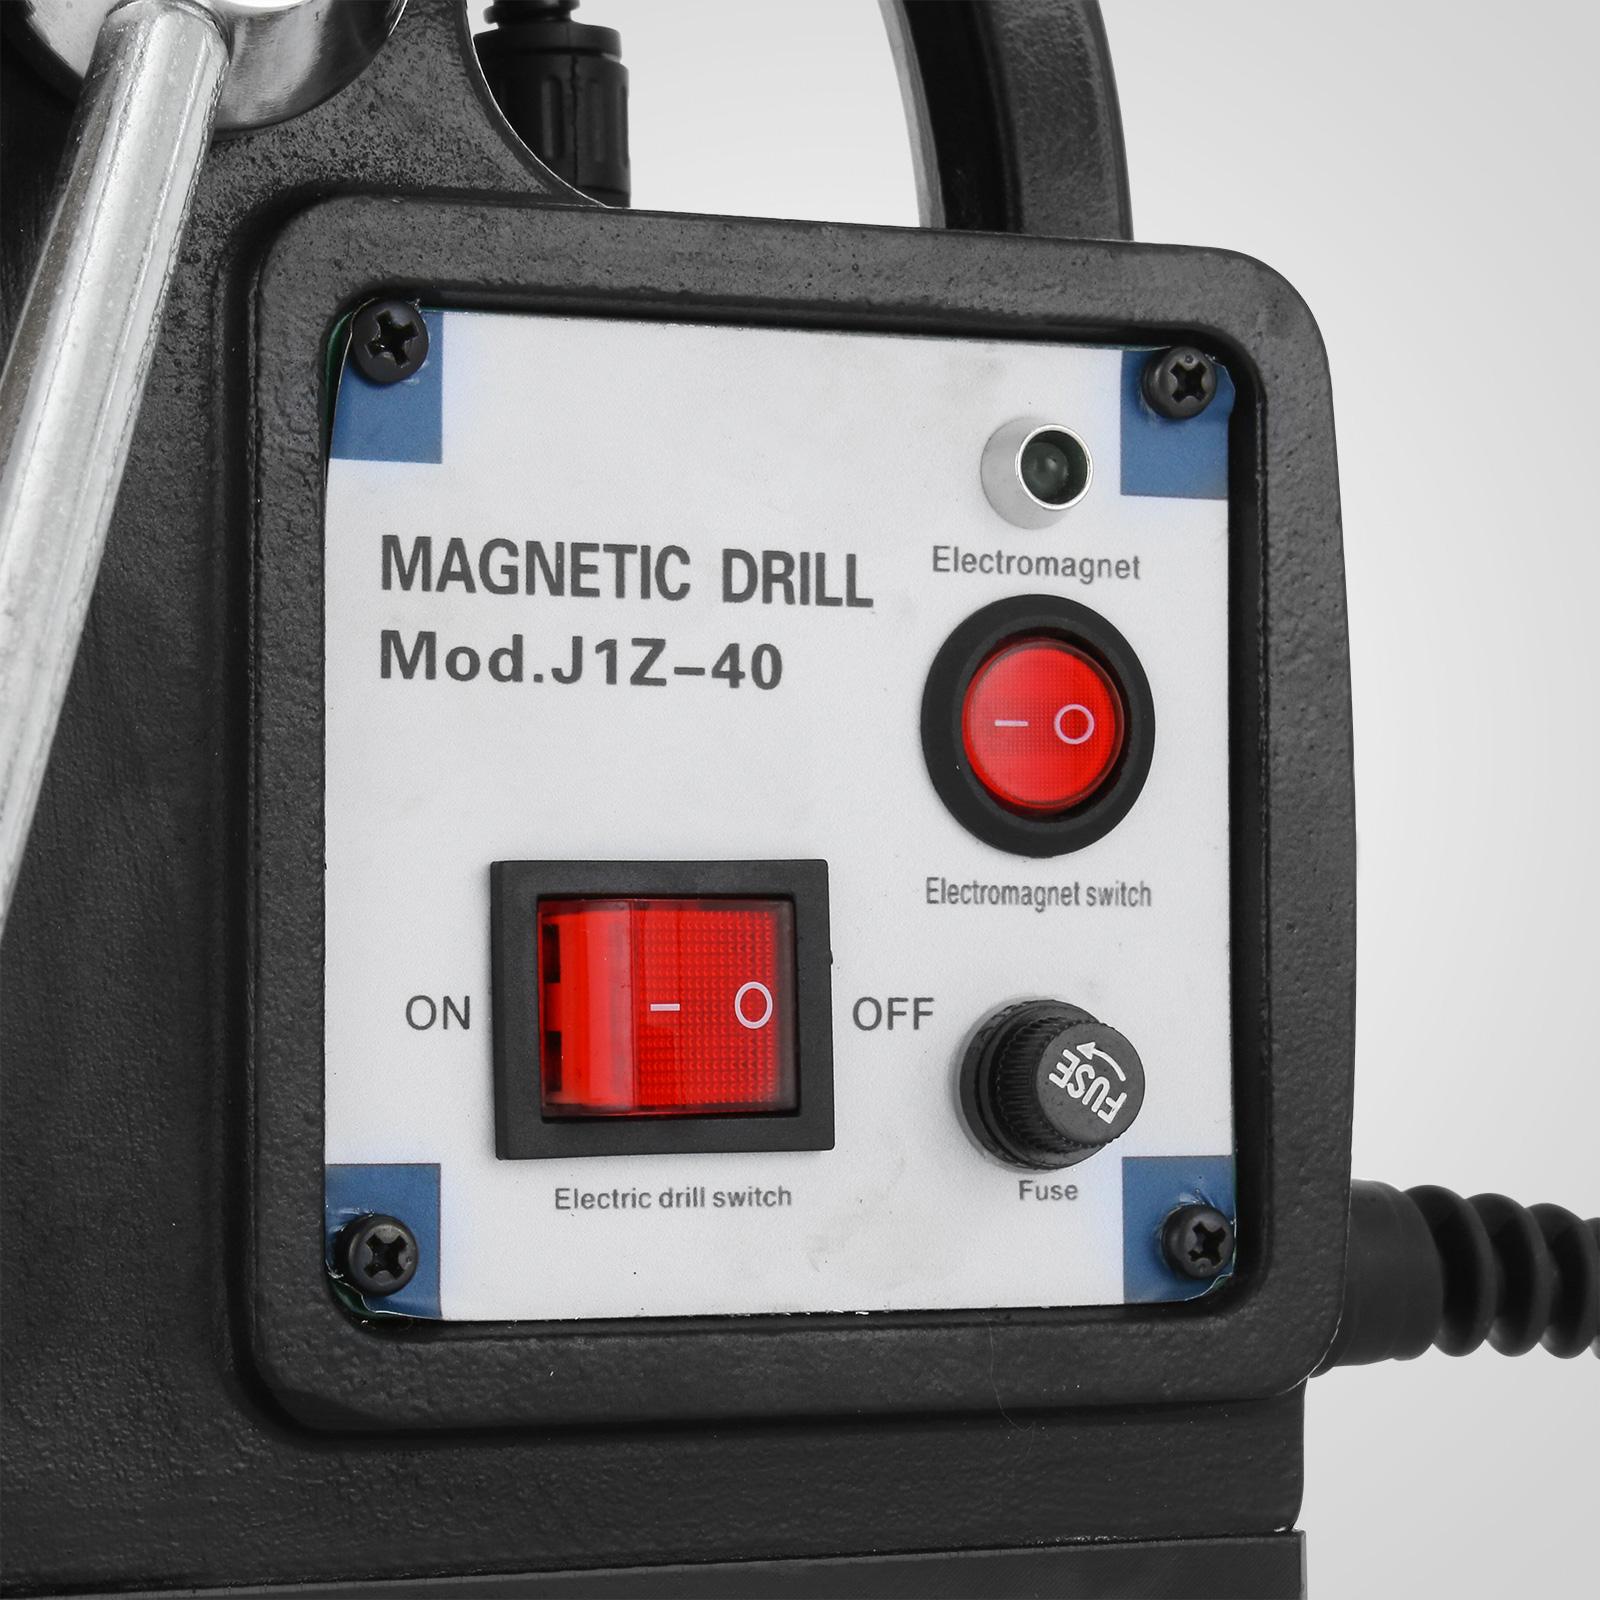 MB23-BRM35-MD40-Trapano-Perforatrice-Carotatore-Fresa-Magnetico-12-40mm-230V miniatura 44